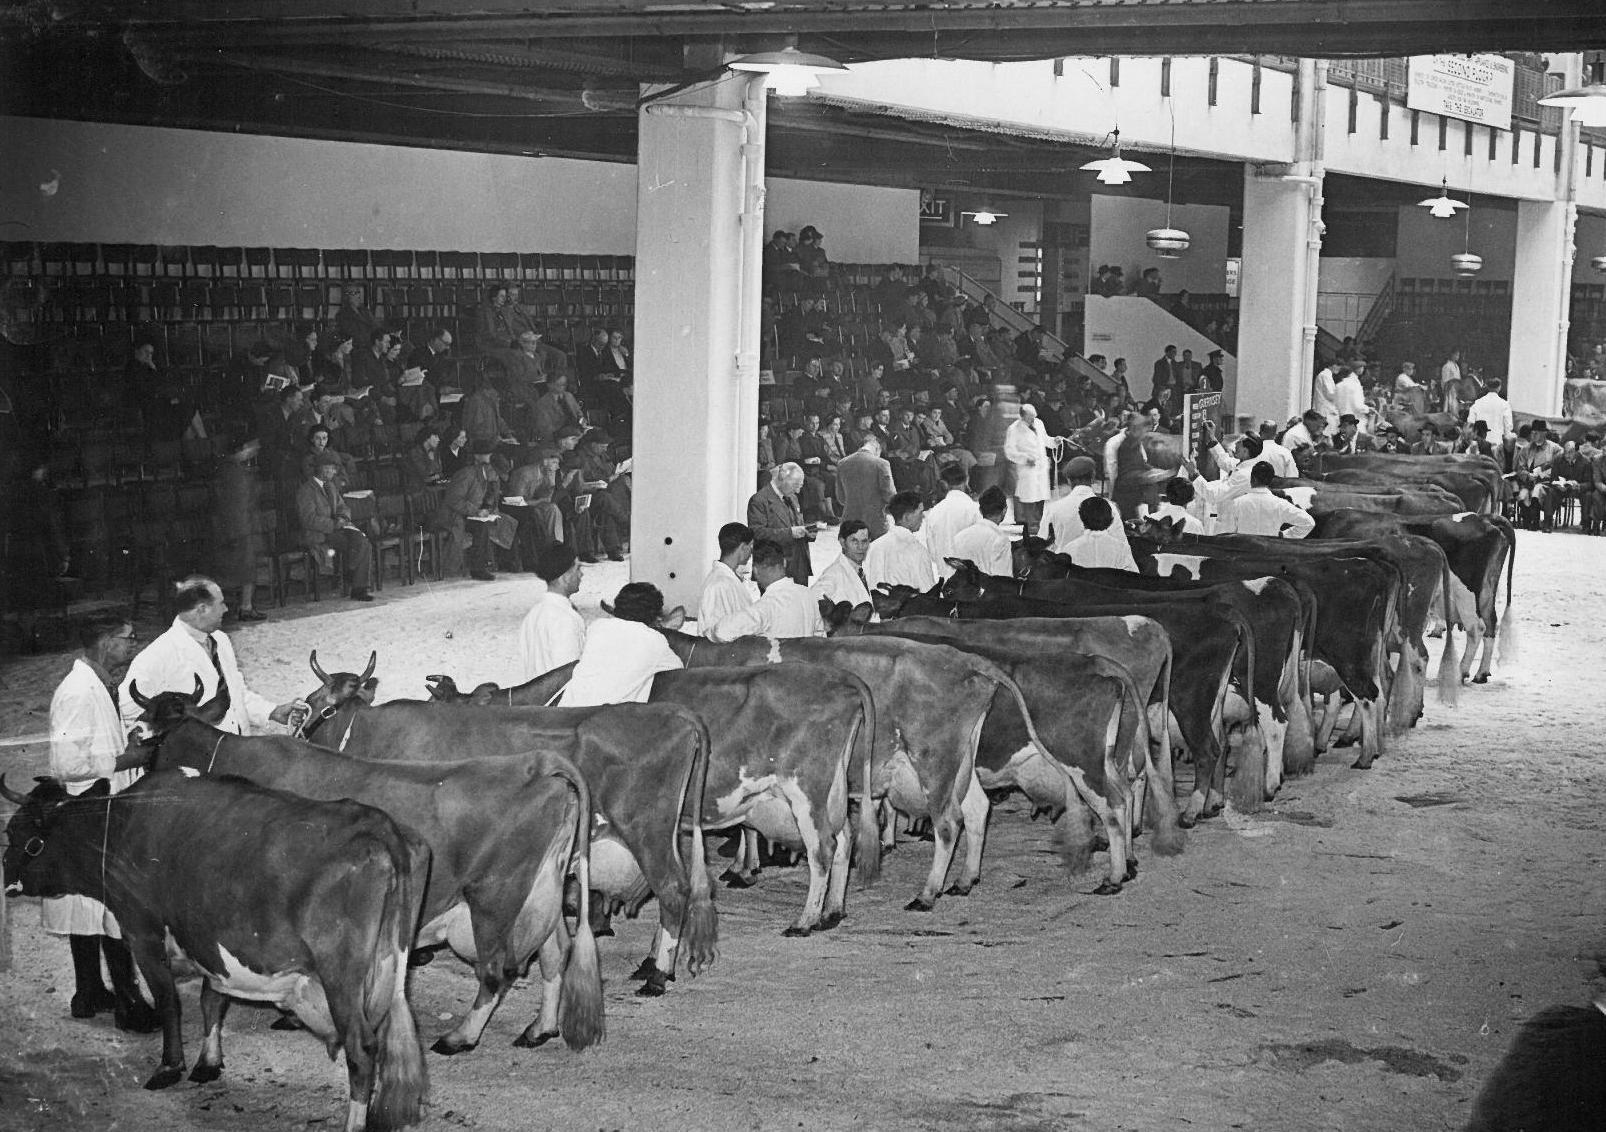 Guernsey judging 1950